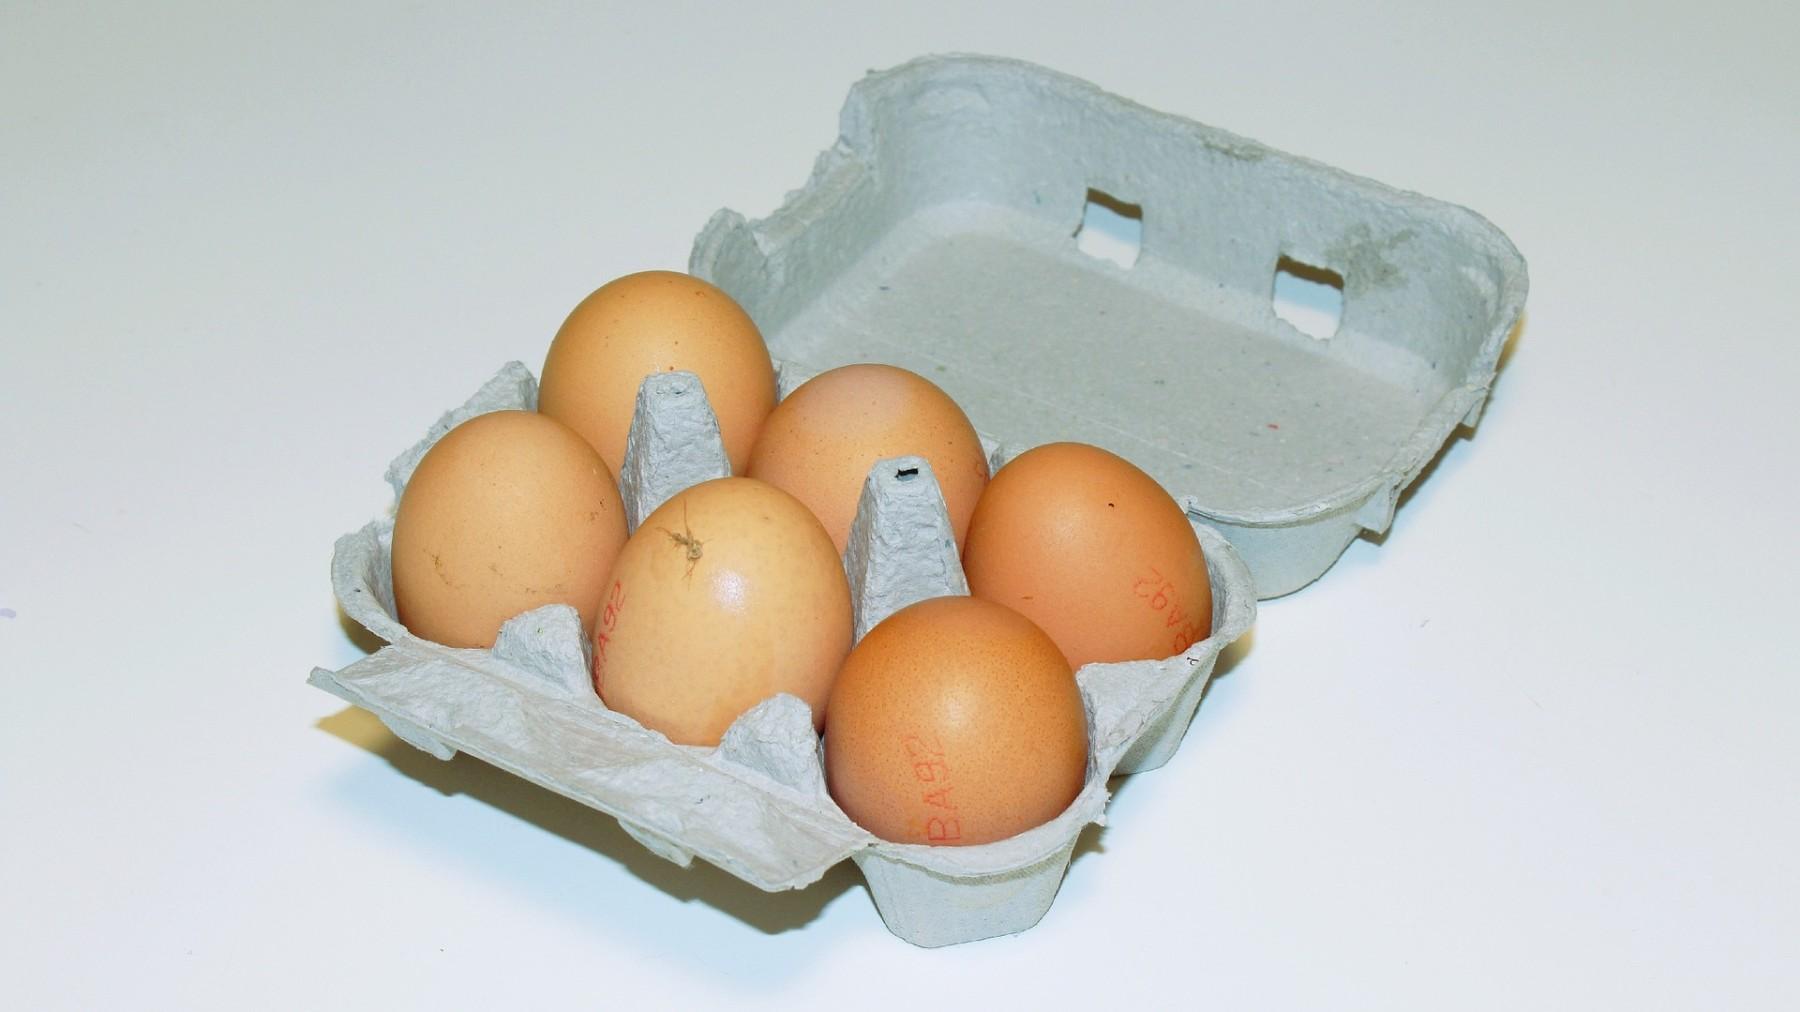 eggs-2147172_1920